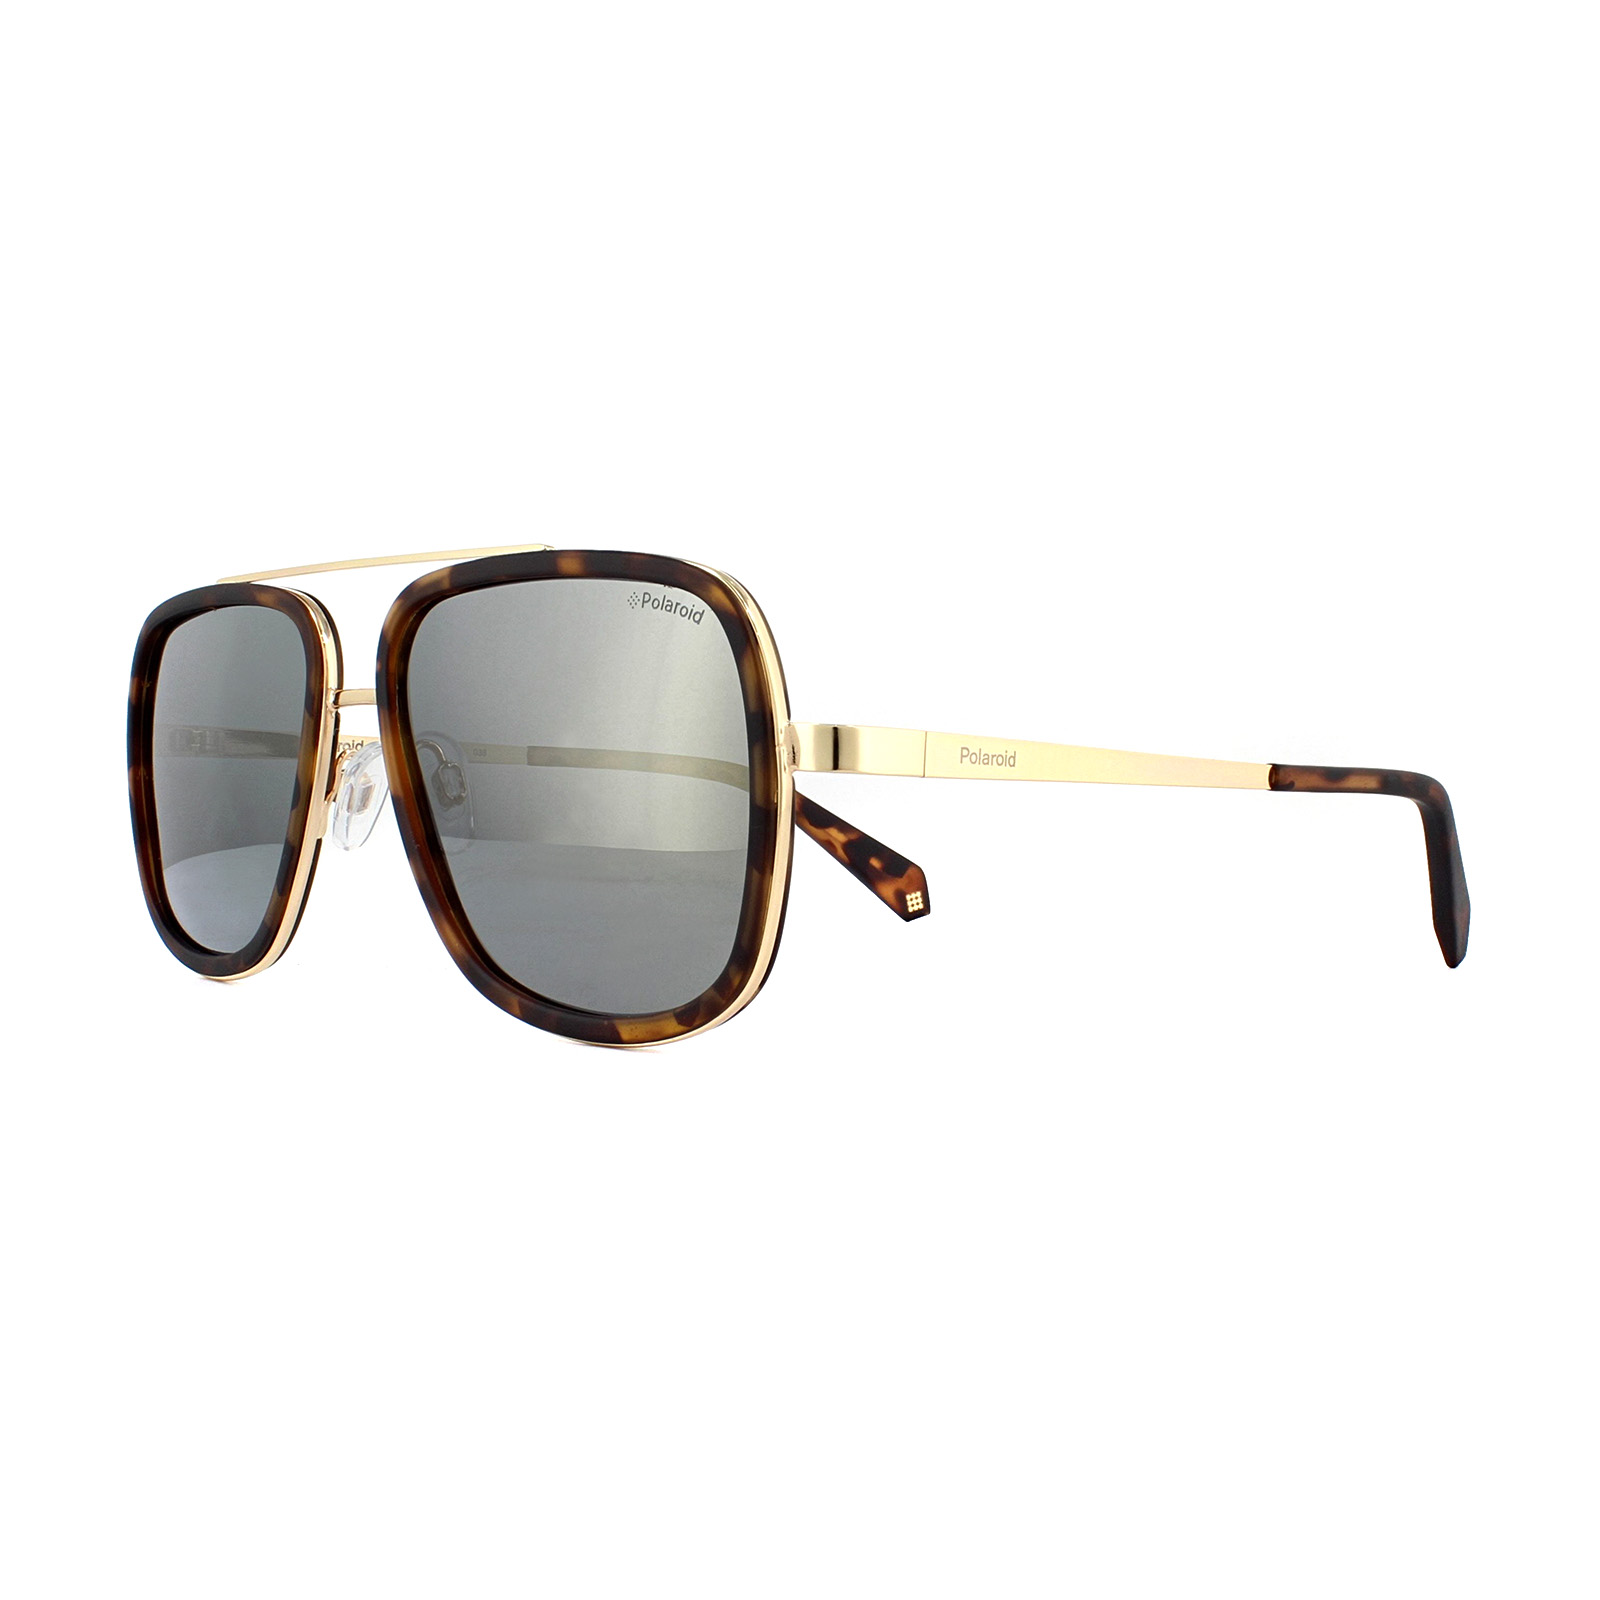 94b48ccd6e7 Sentinel Polaroid Sunglasses PLD 6033 S 086 LM Dark Havana Grey Gold Mirror  Polarized